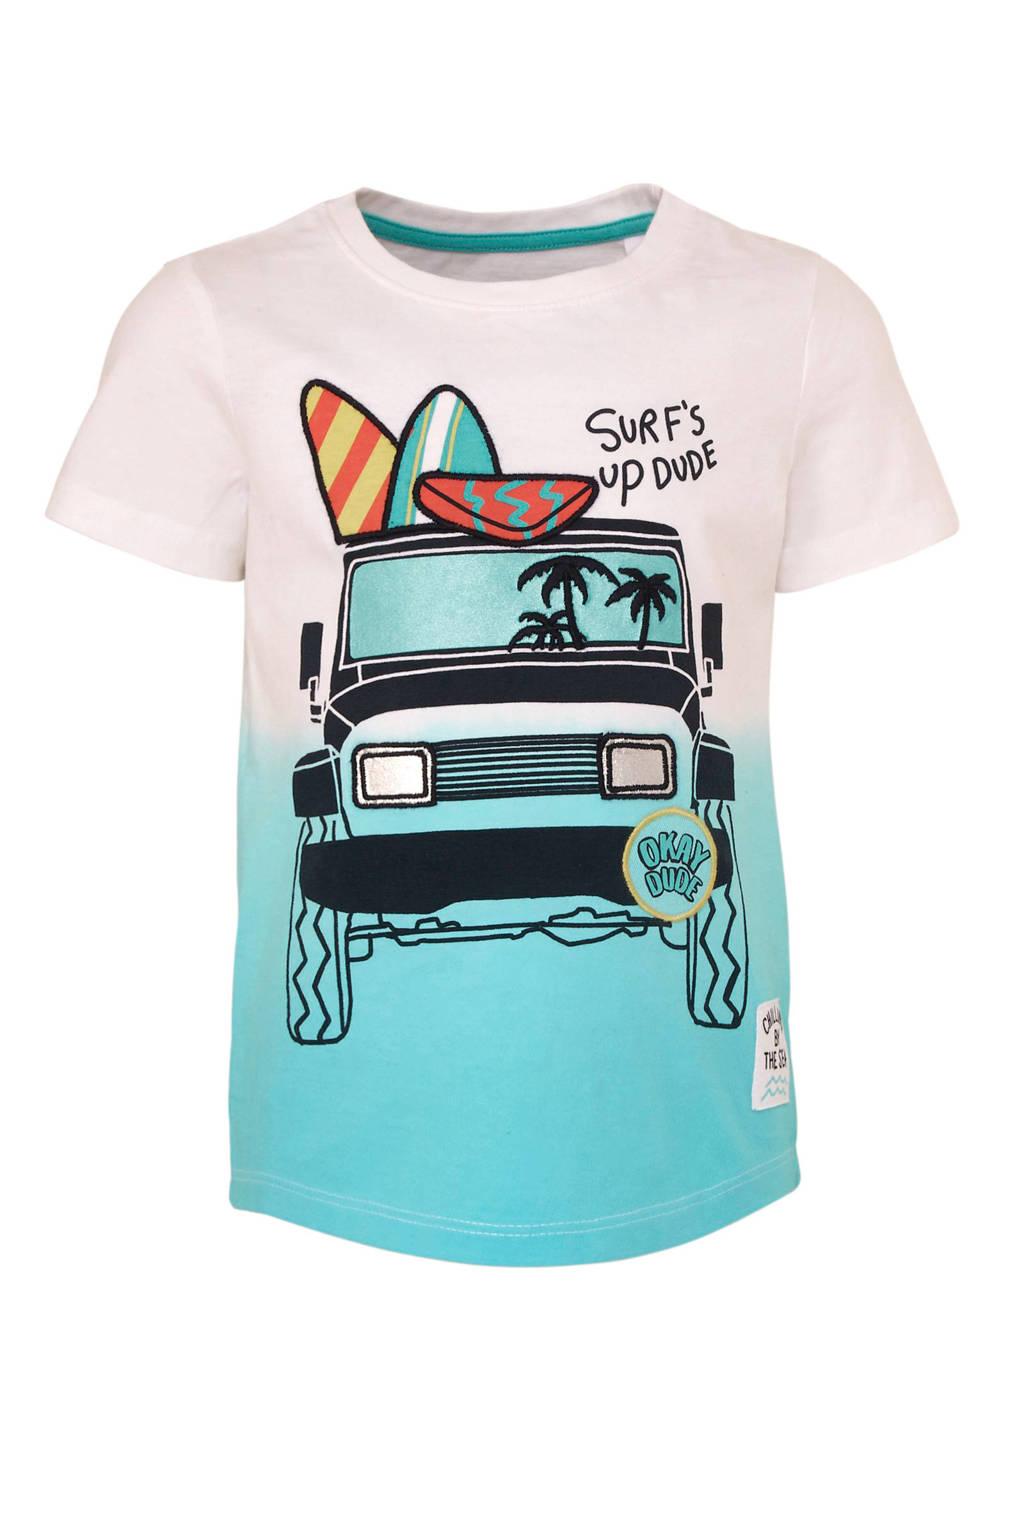 C&A Palomino T-shirt met printopdruk wit/turquoise, Wit/turquoise